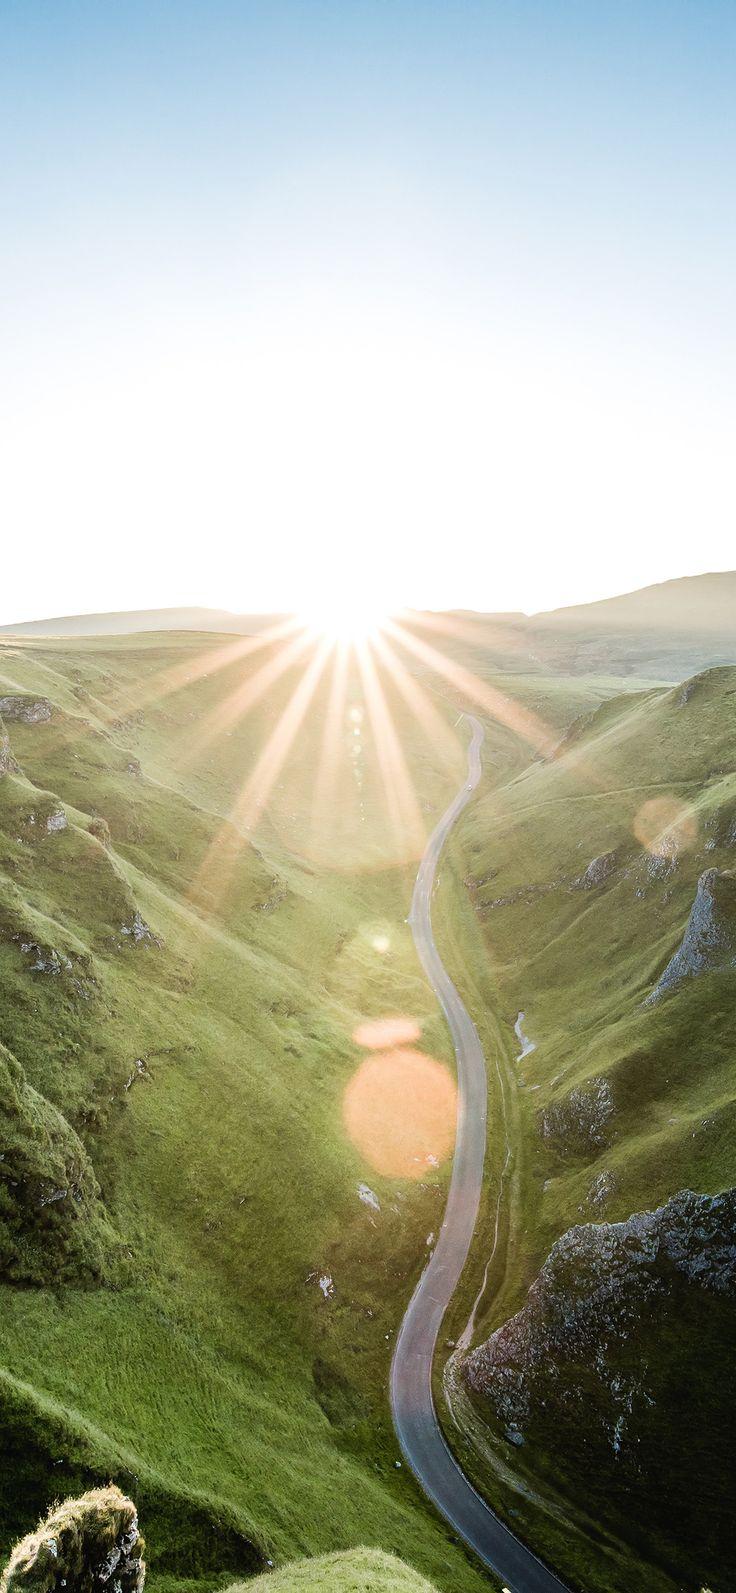 Iphone X Wallpaper Oa14 Mountain Light Sun Nature Via